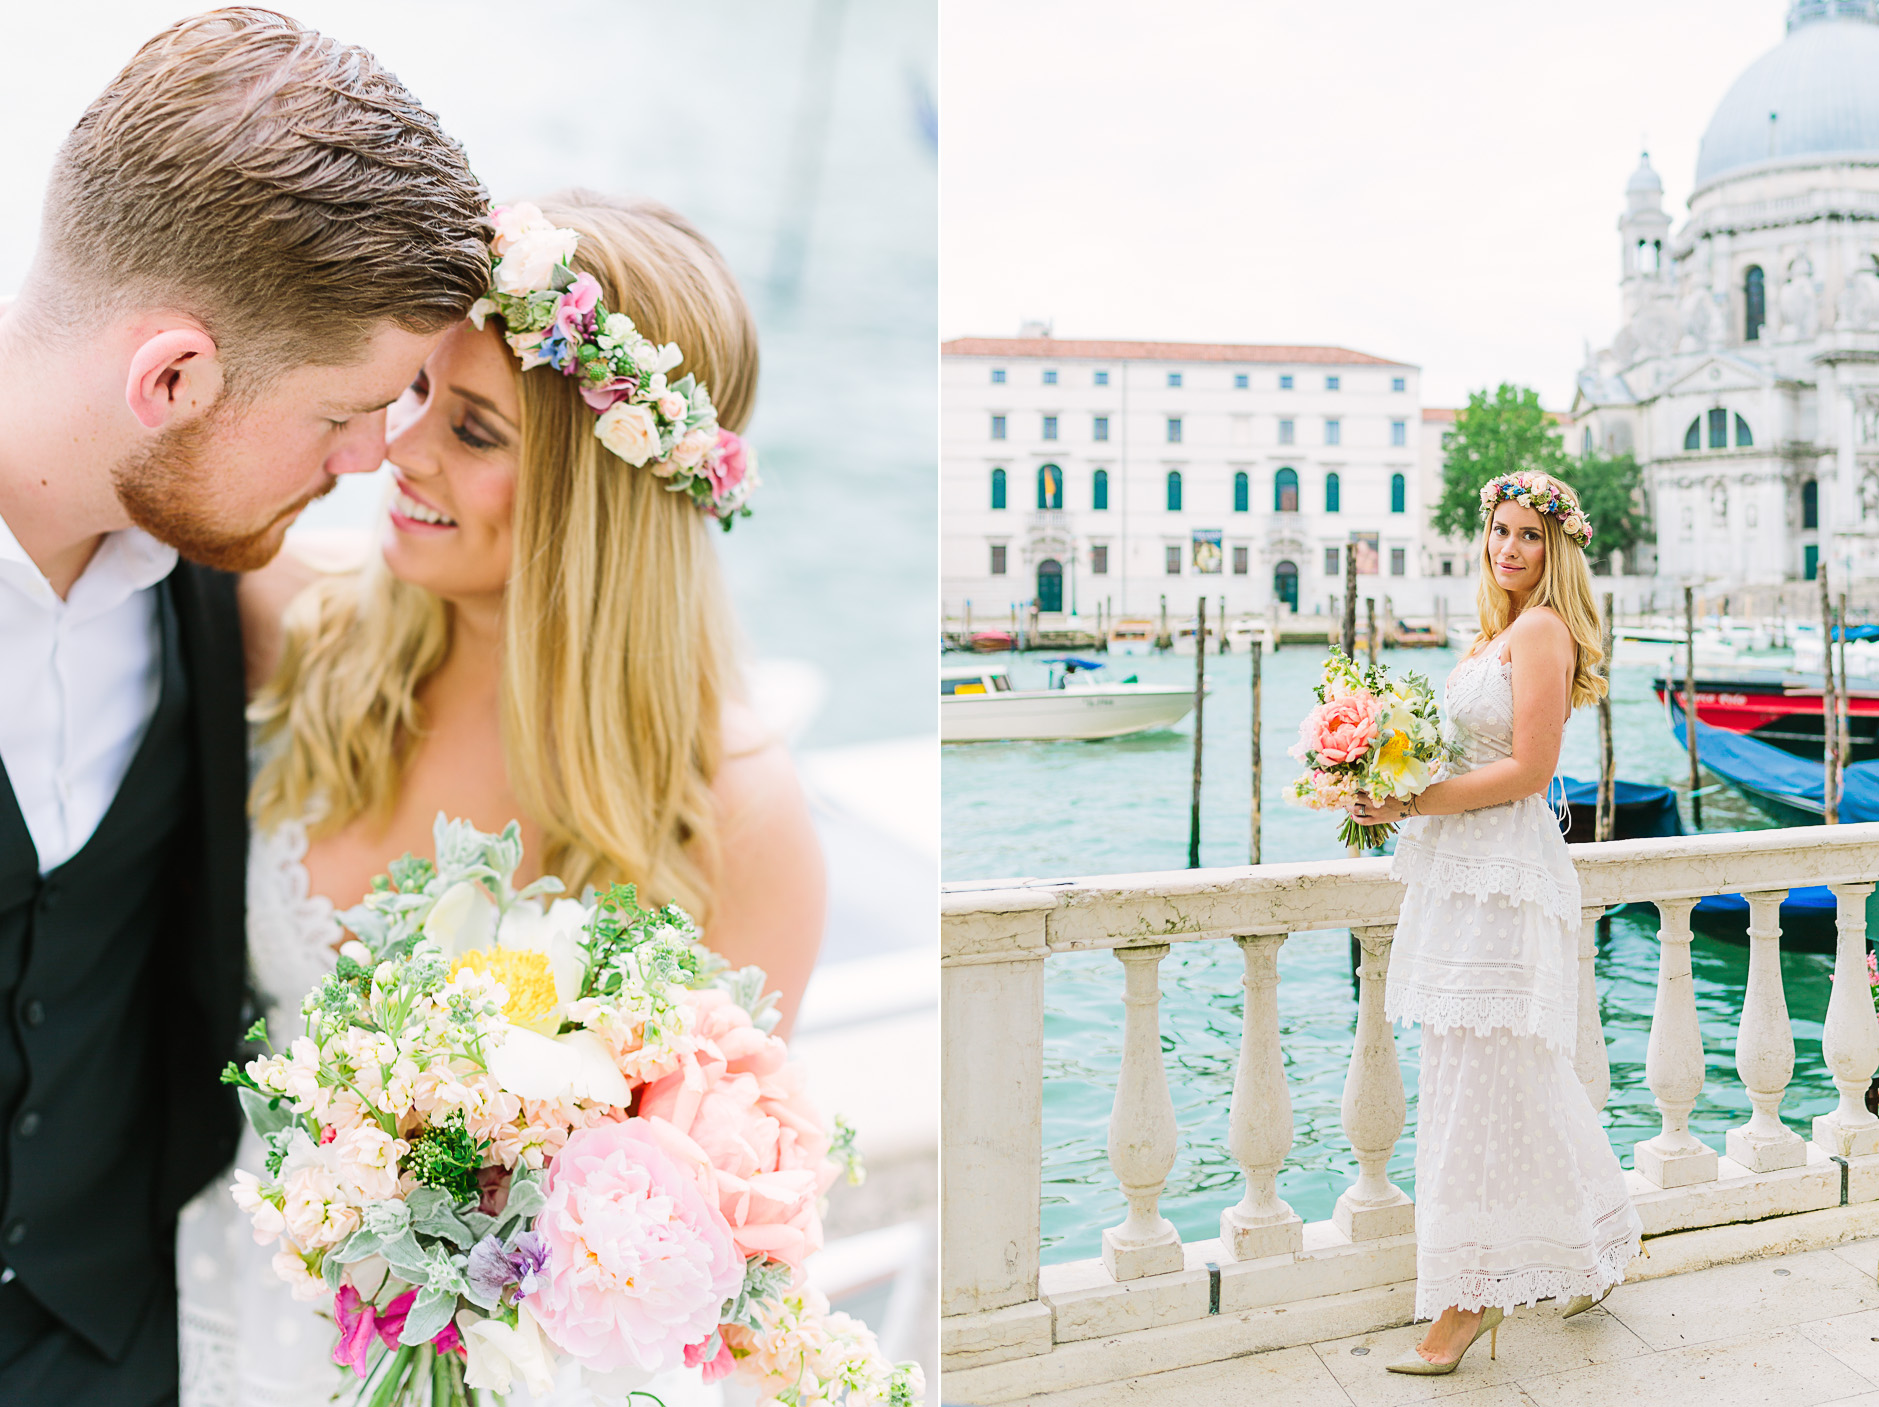 Hochzeitsfotograf Le Hai Linh Boho Chic After Wedding Shooting Venedig Timo Horn 1.FC Koeln 029.jpg